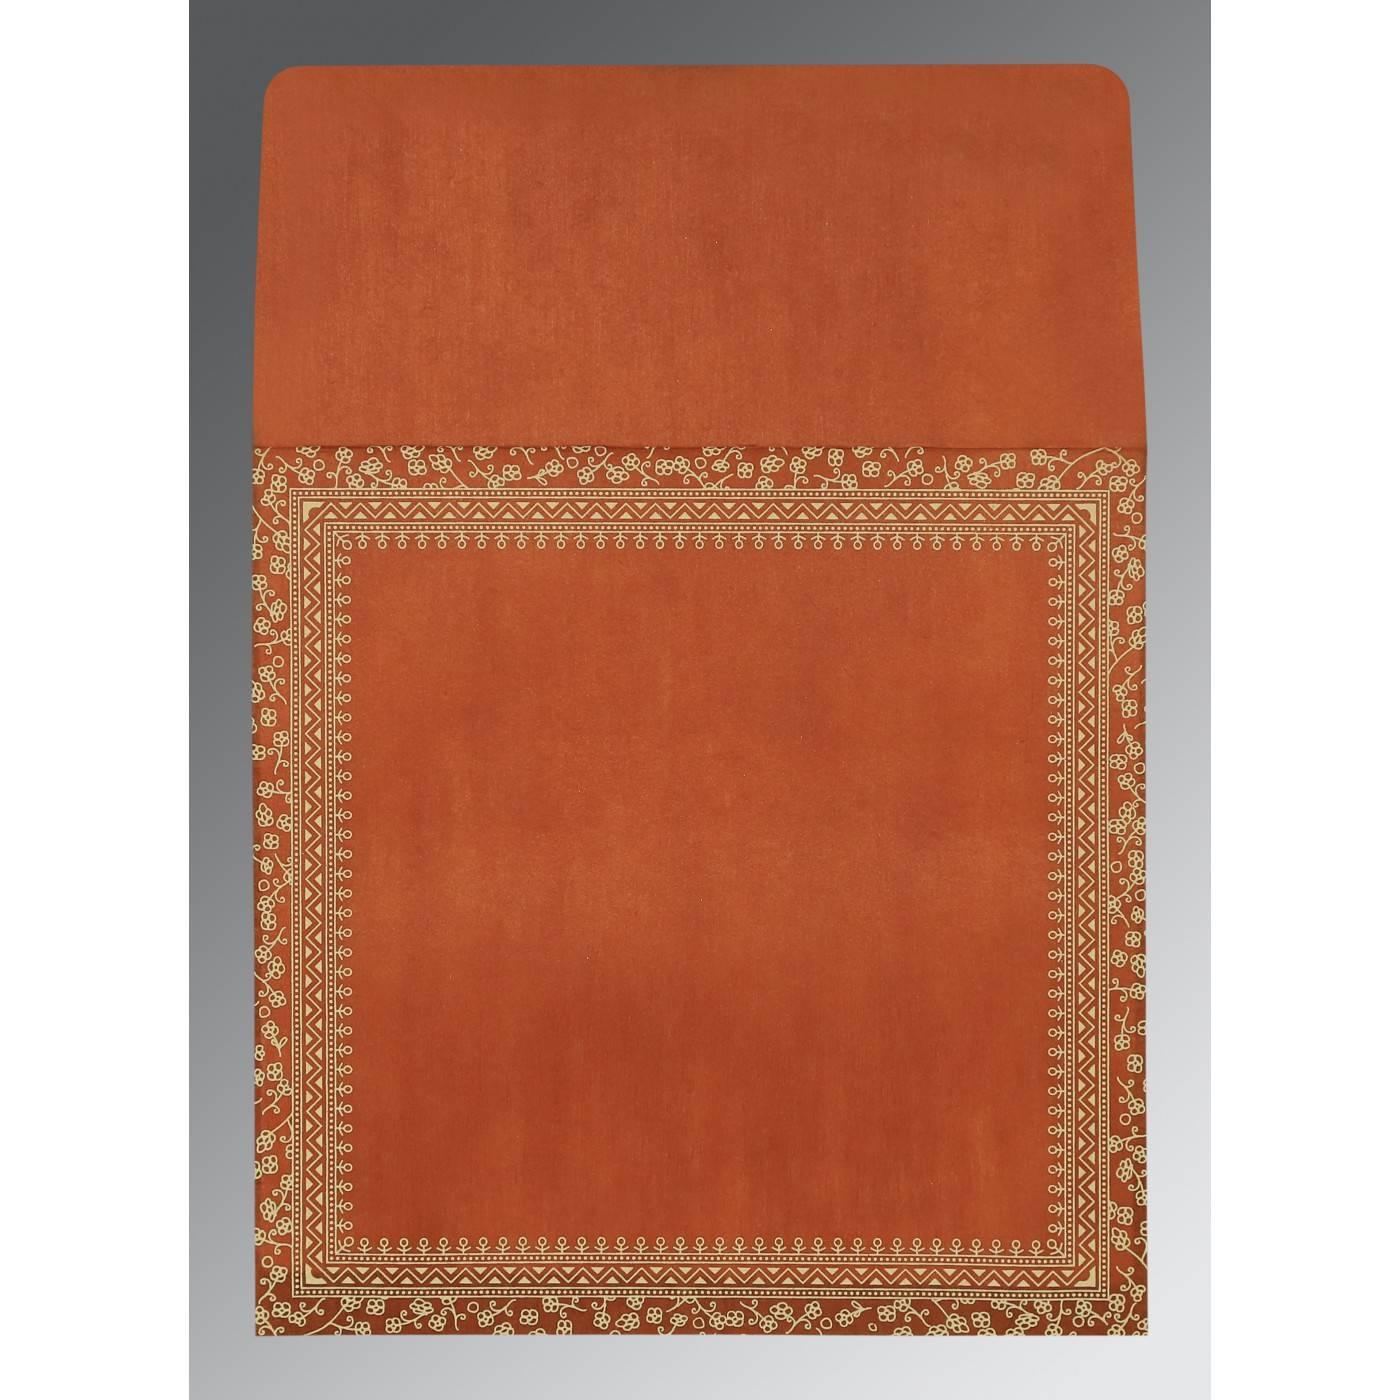 BURNT ORANGE WOOLY SCREEN PRINTED WEDDING CARD : CRU-1050 - IndianWeddingCards